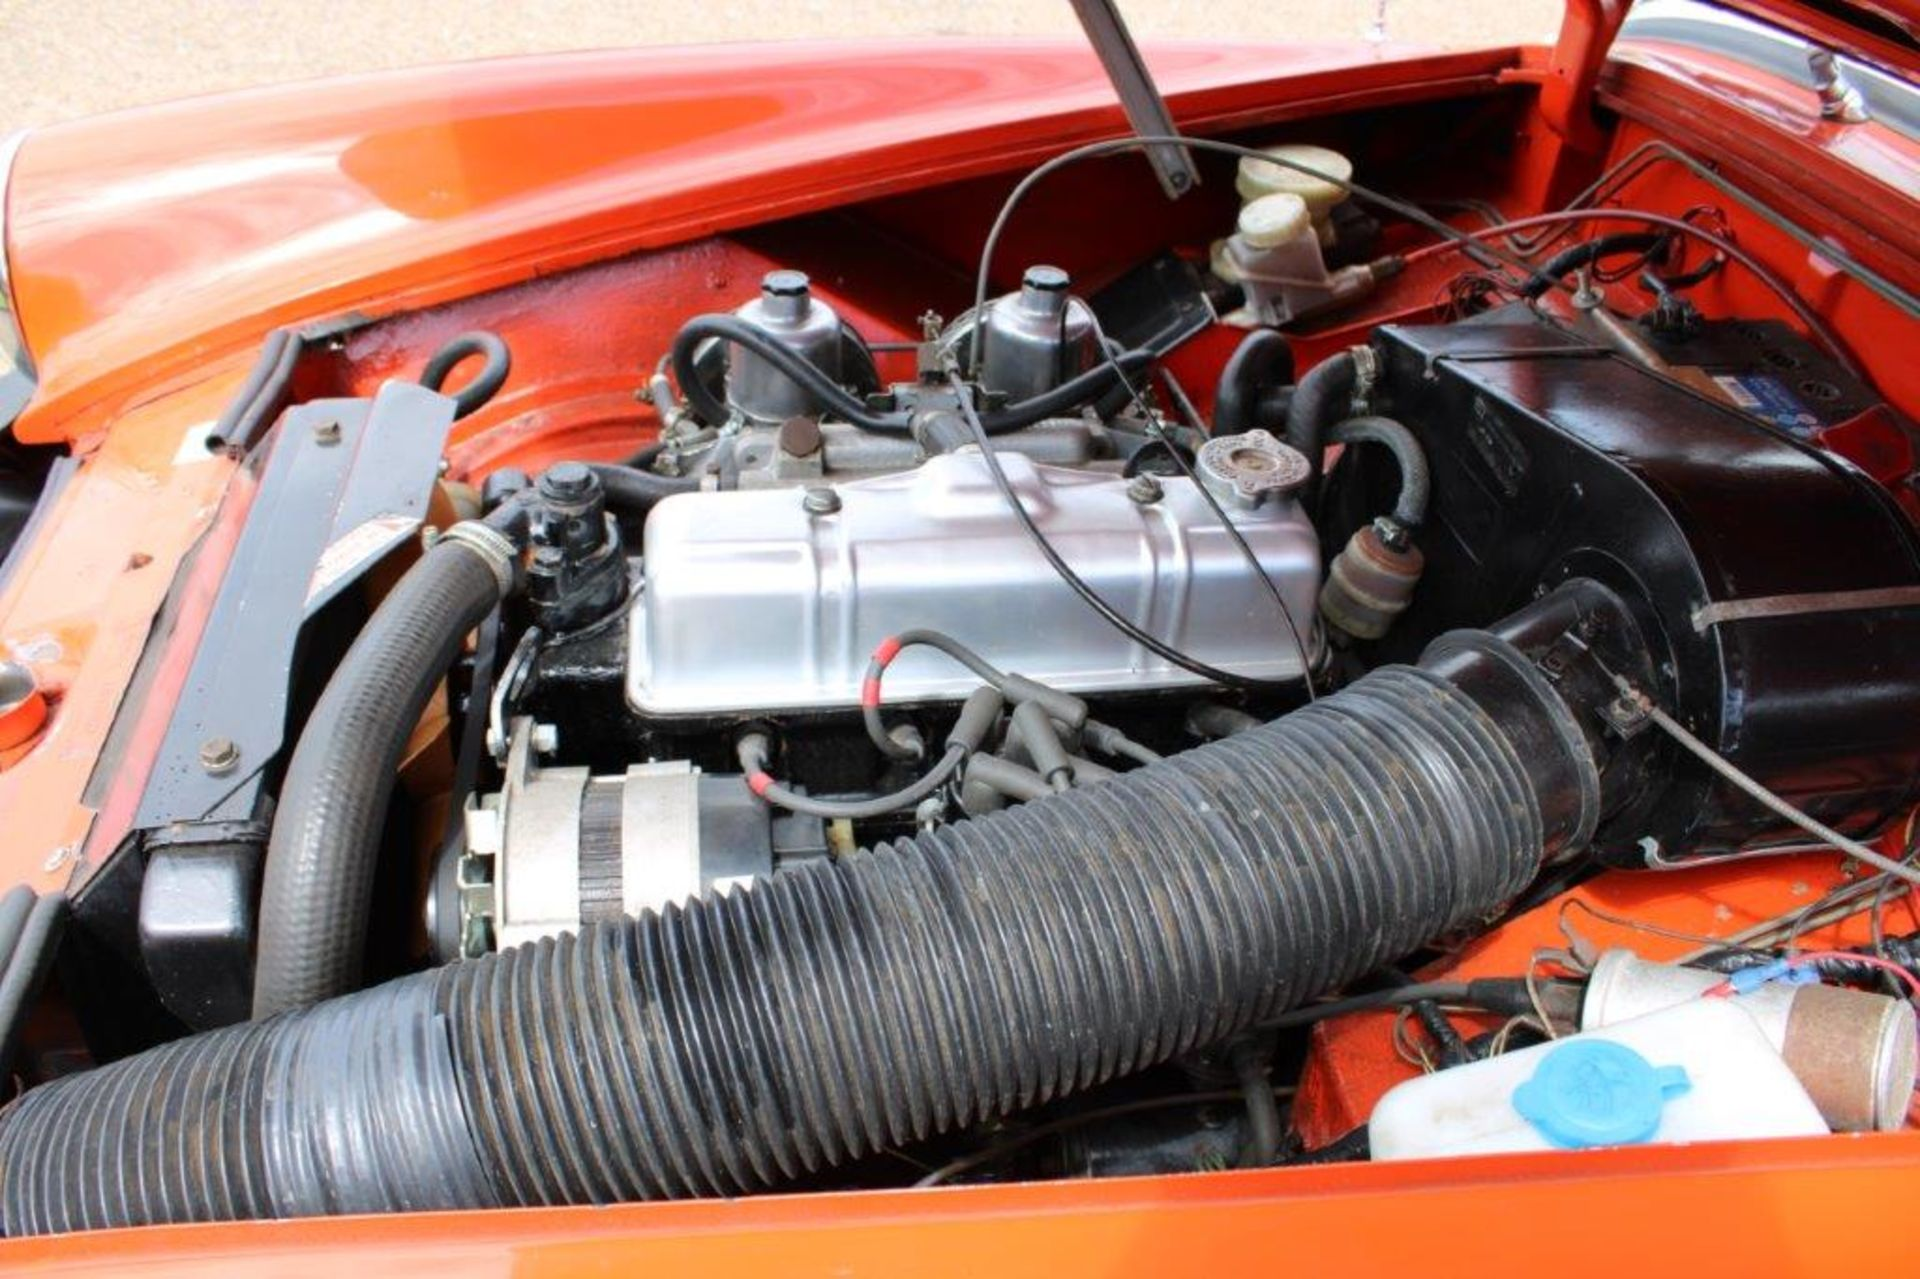 1979 MG Midget 1500 - Image 23 of 37